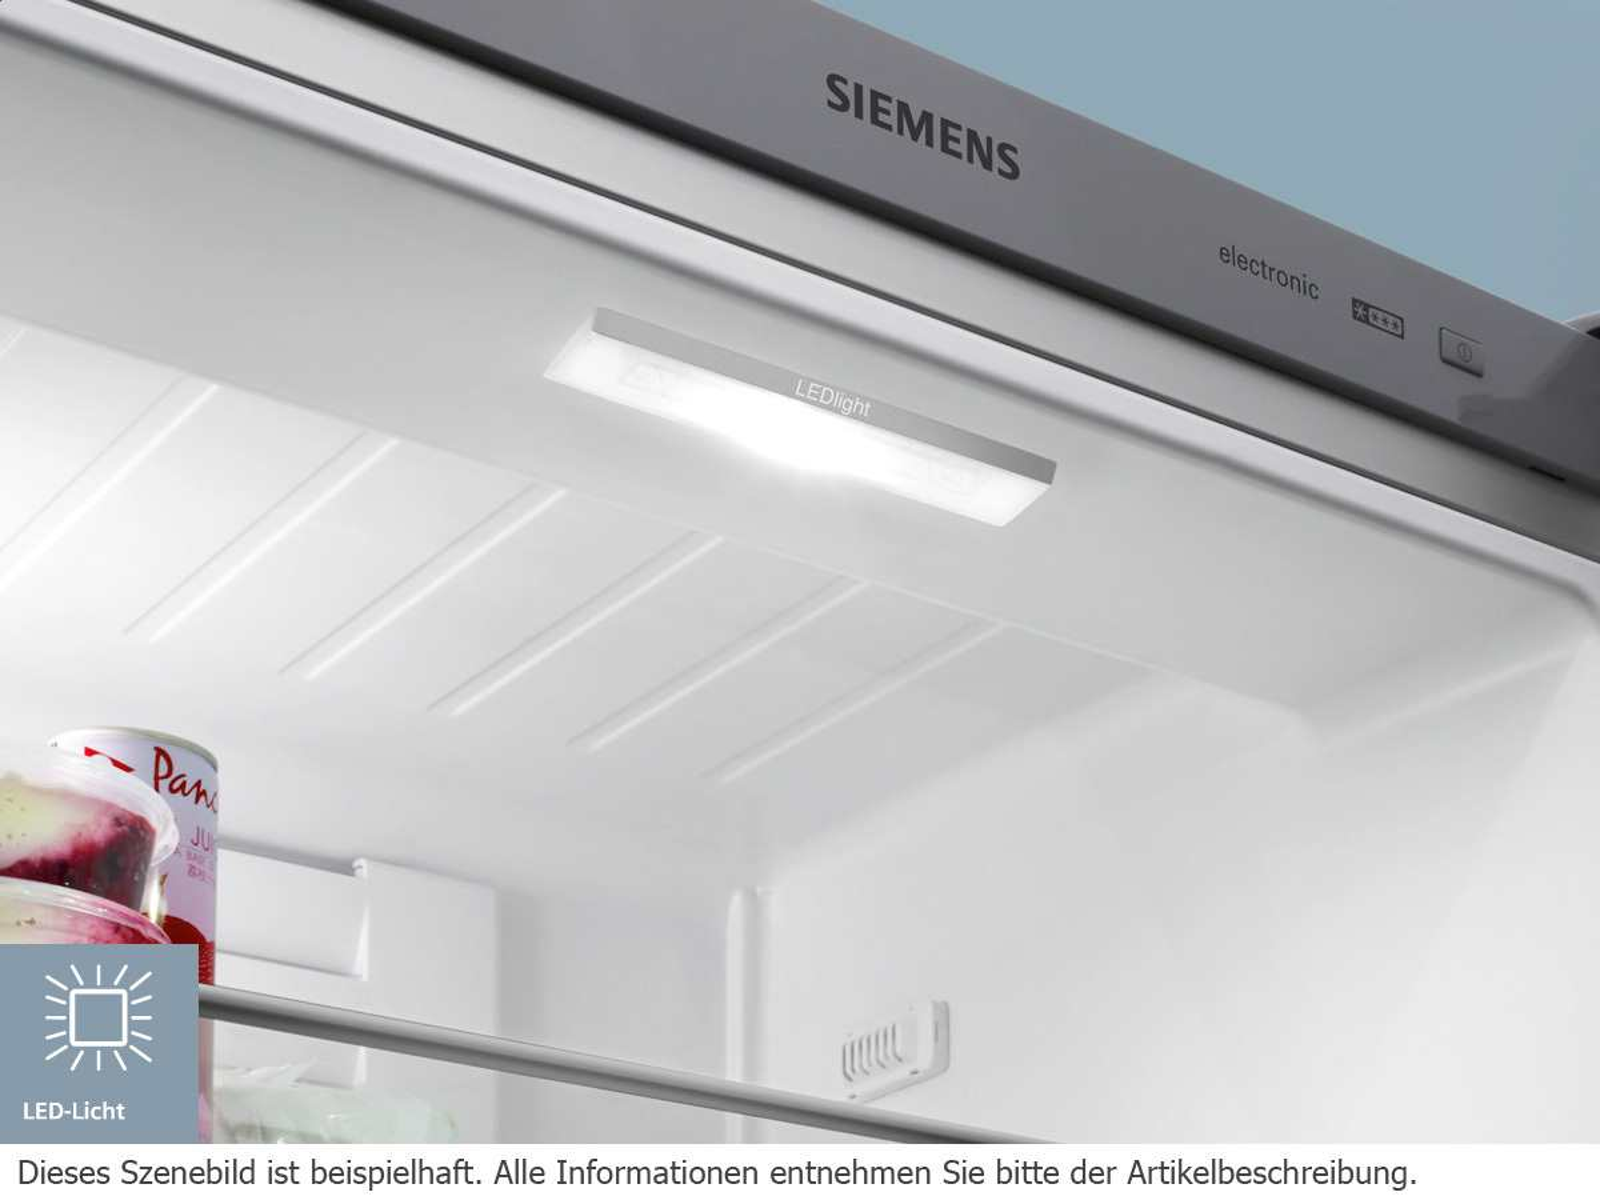 Siemens Kühlschrank Kg36vvl32 : Siemens kg36vvl32 kühl gefrierkombination edelstahl look